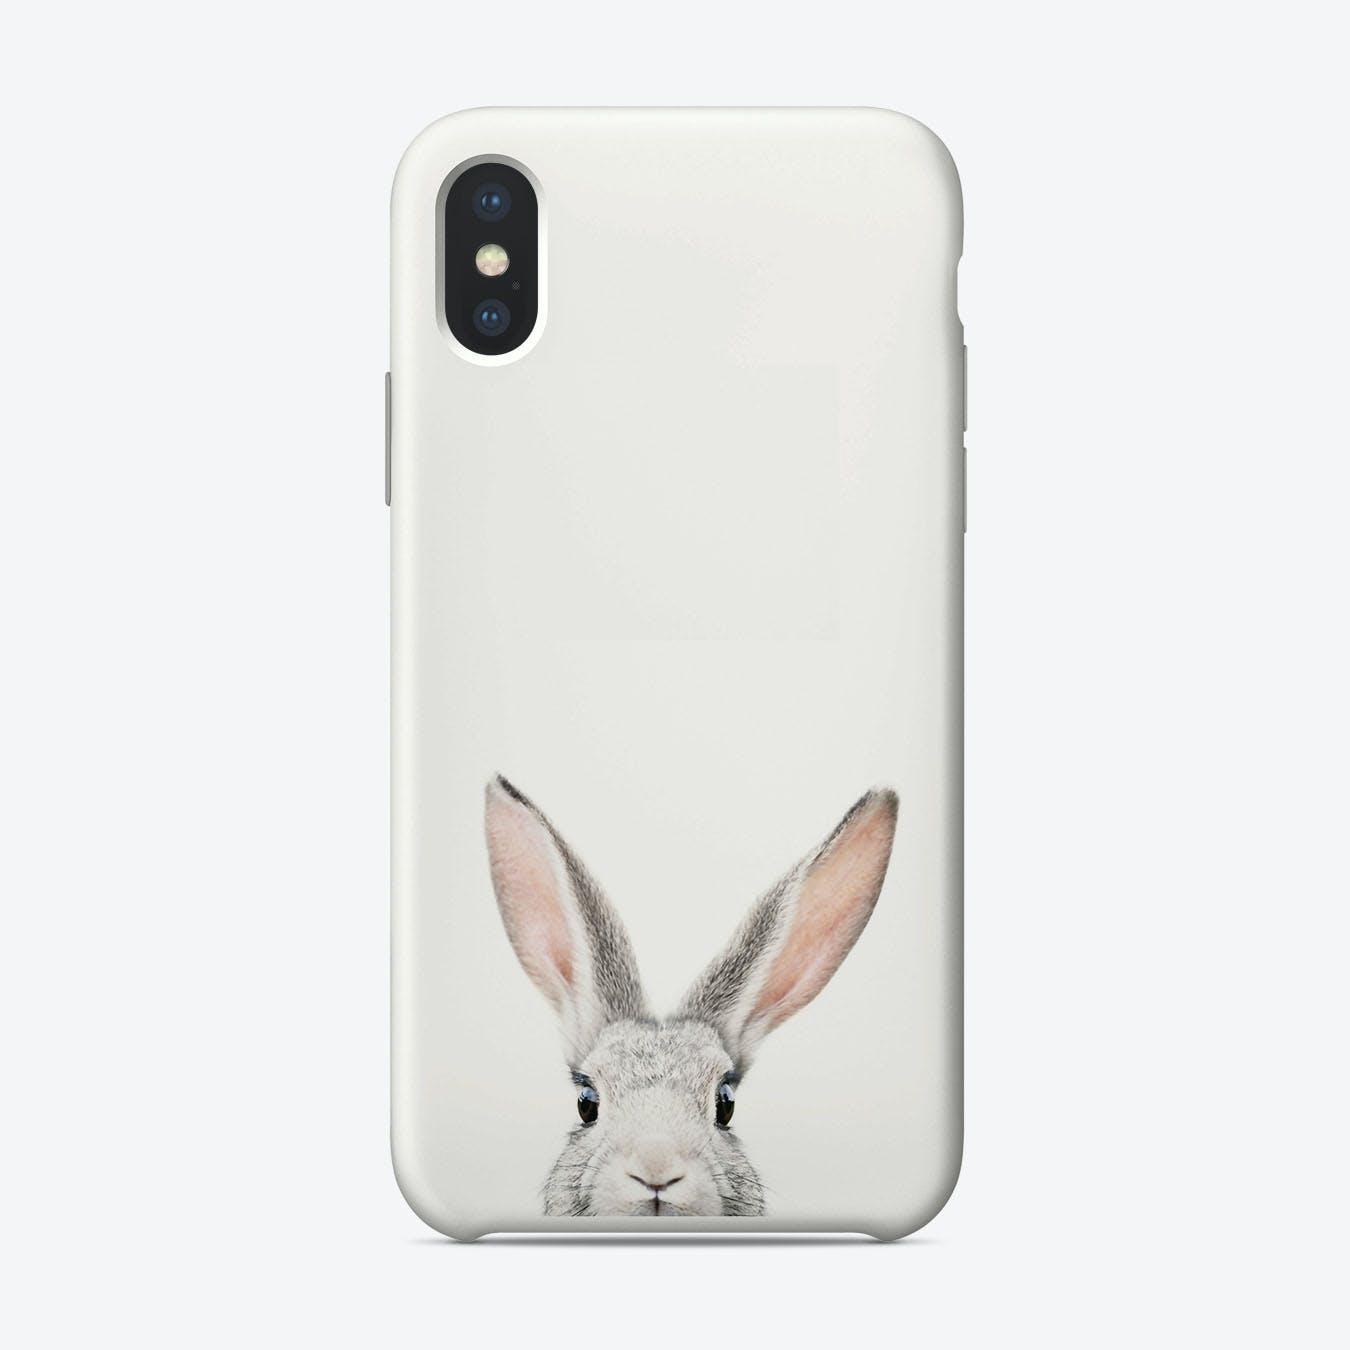 Peekaboo Bunny iPhone Case